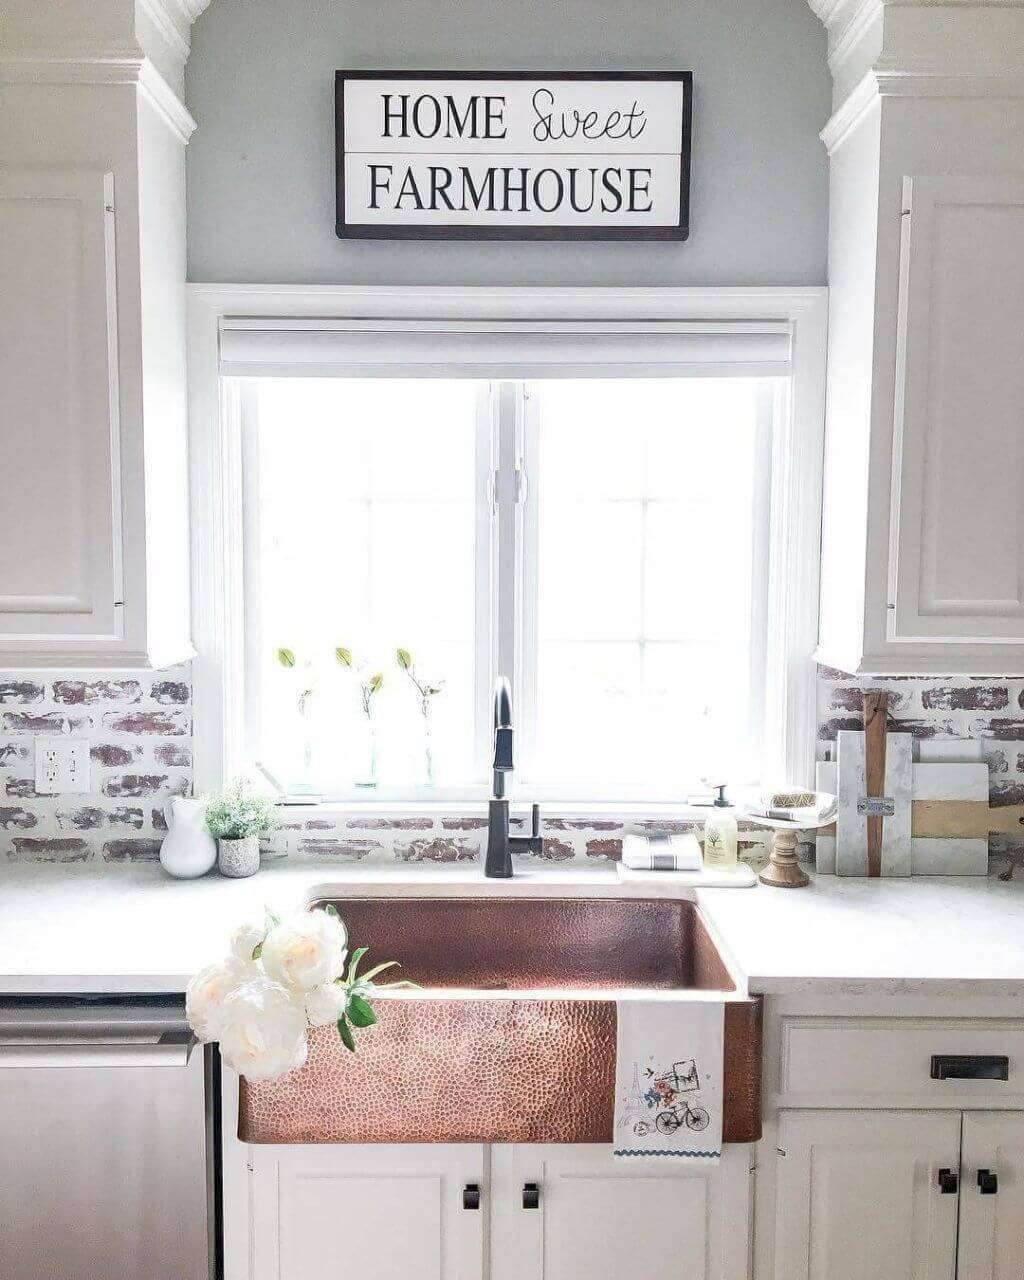 Move Over Kitchen Backsplash Ideas Camaxid Com Kitchen Remodel Layout Farmhouse Kitchen Backsplash Kitchen Remodel Small